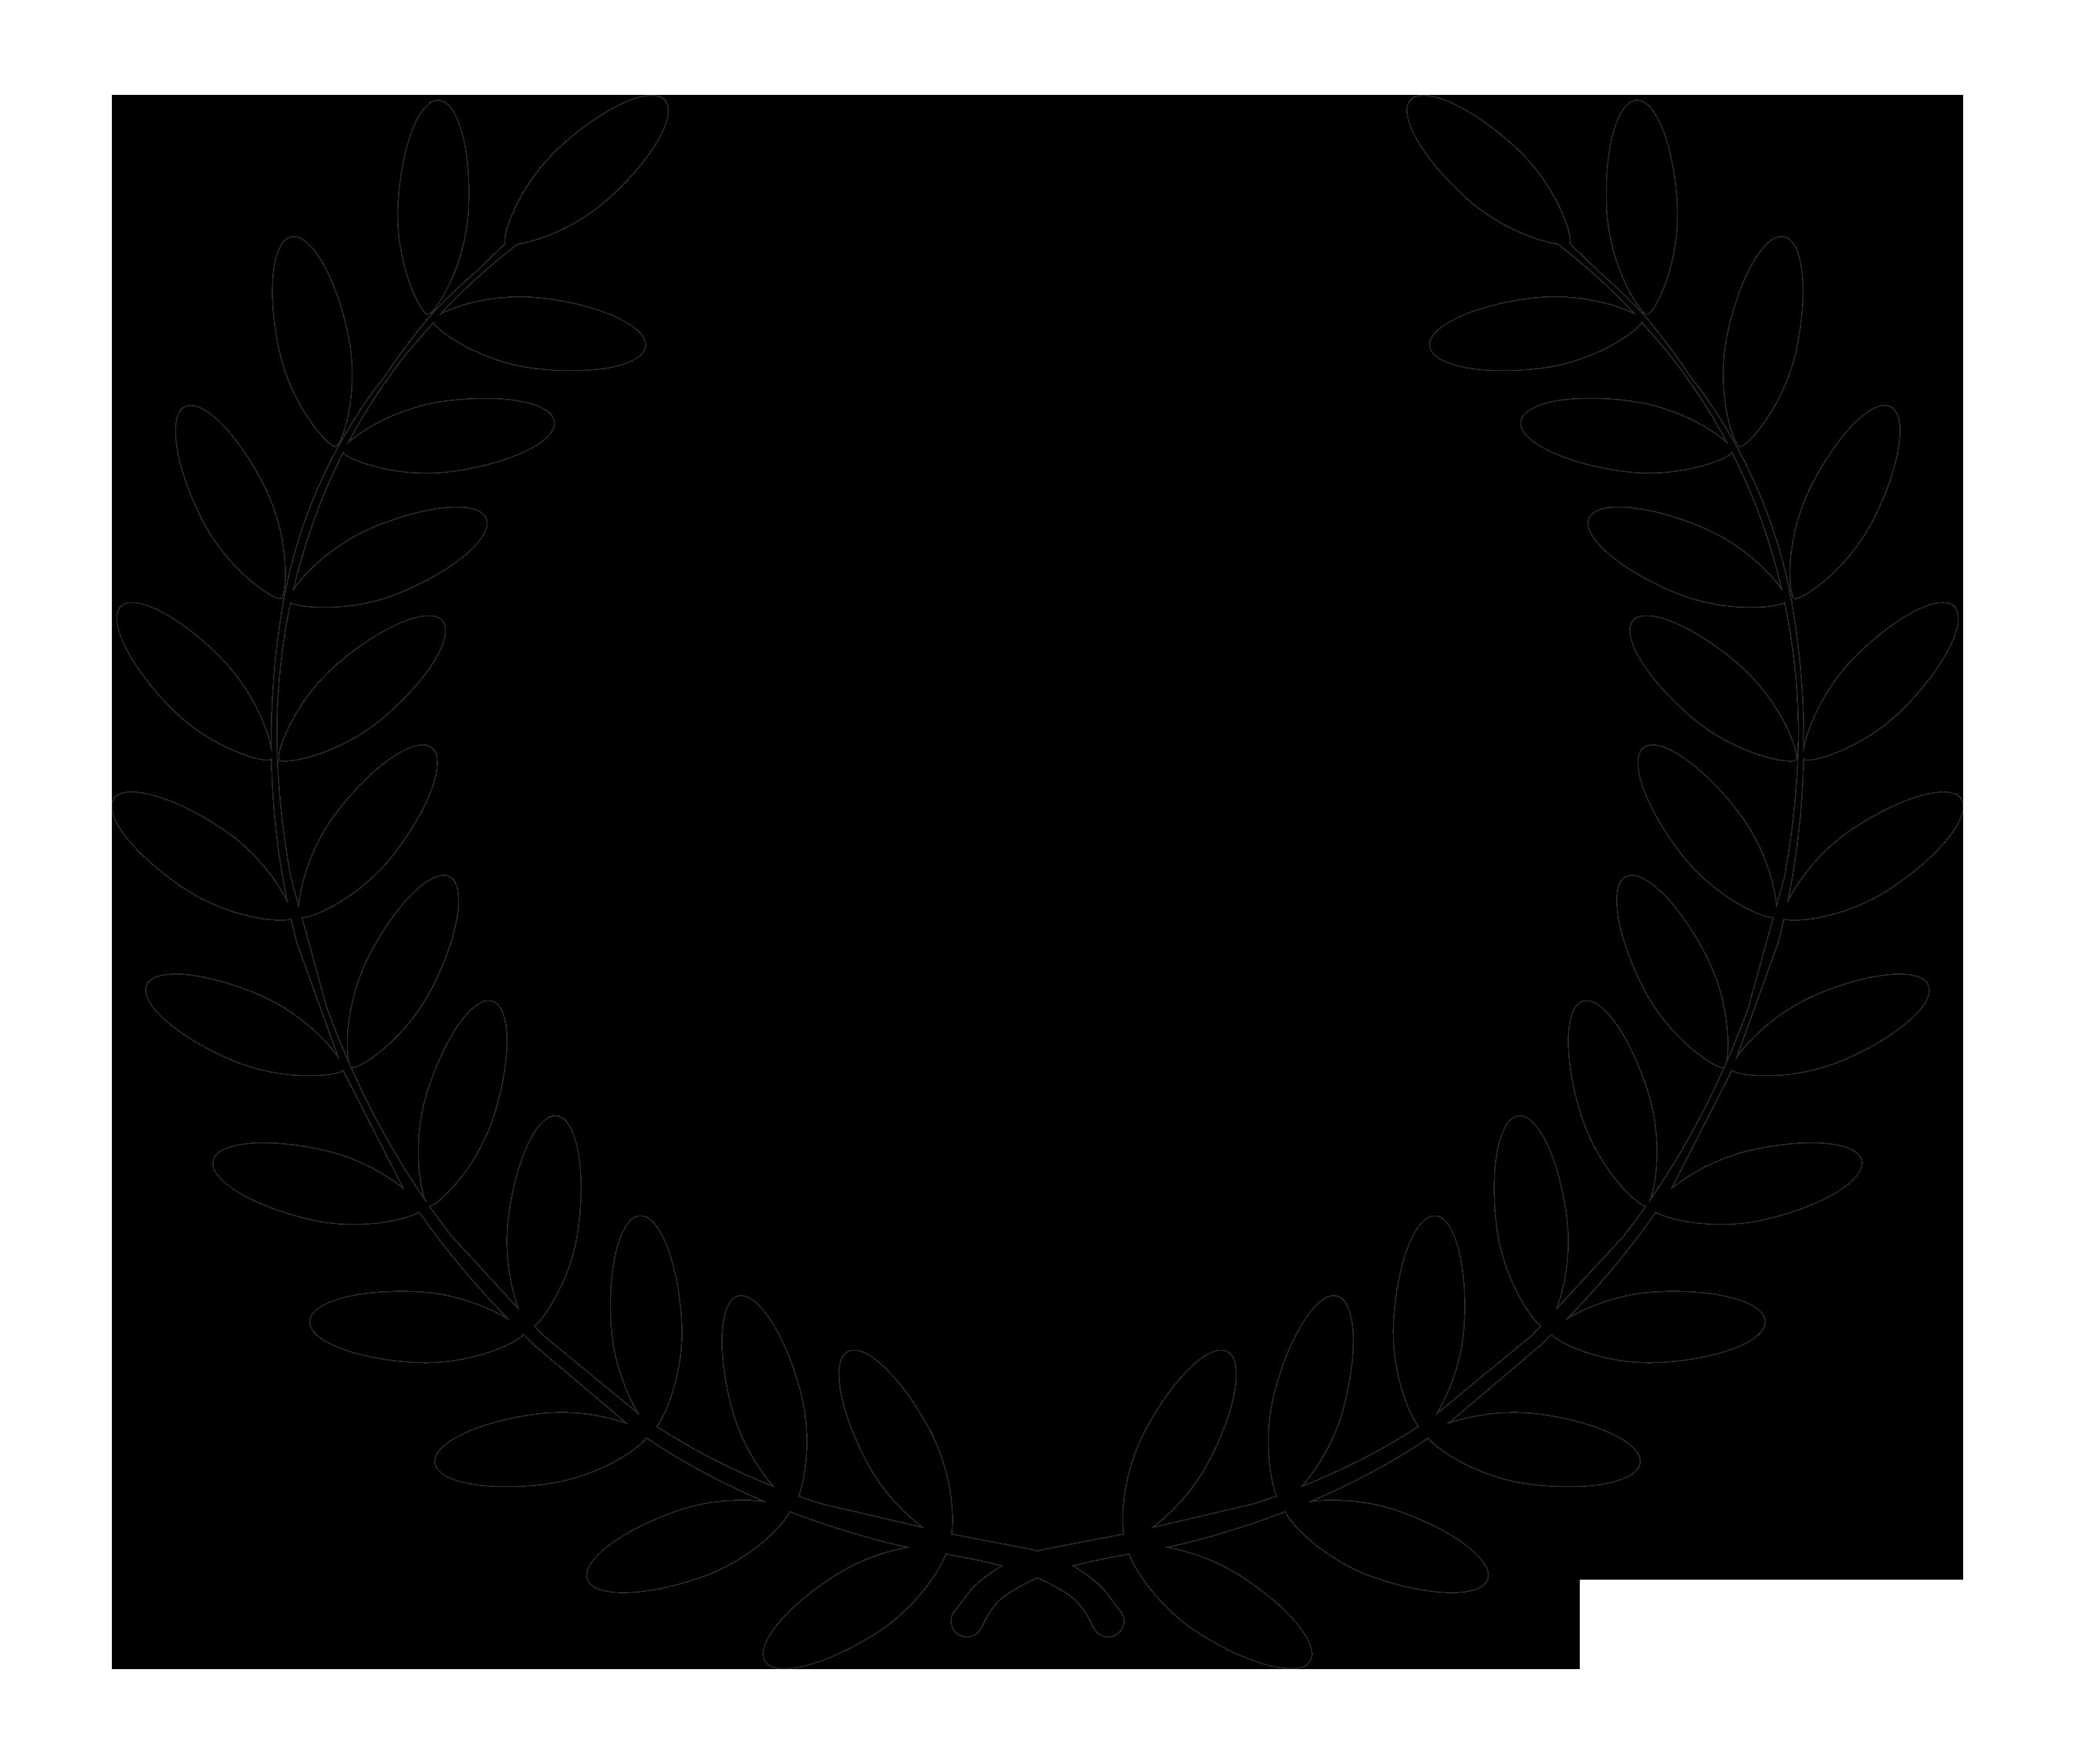 Black Flower 21st Century Op Art Set: Free Download Best Fern Leaf Clipart